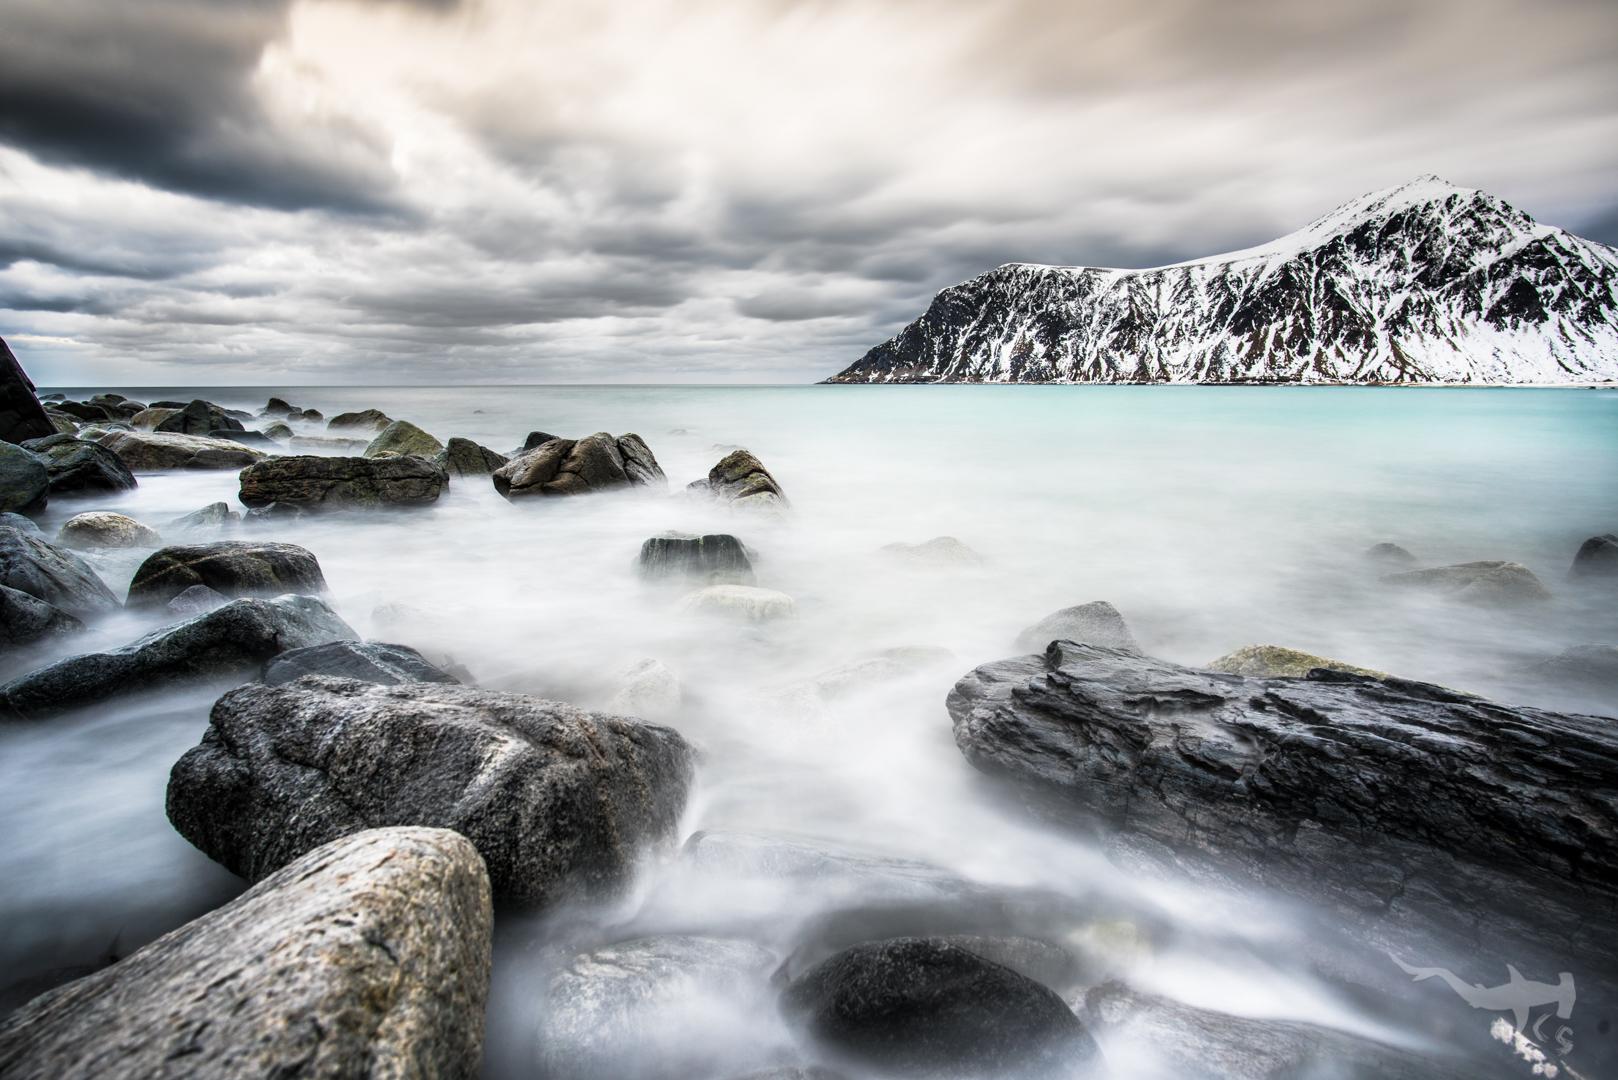 Stones in the Sea - Lofoten/Norway